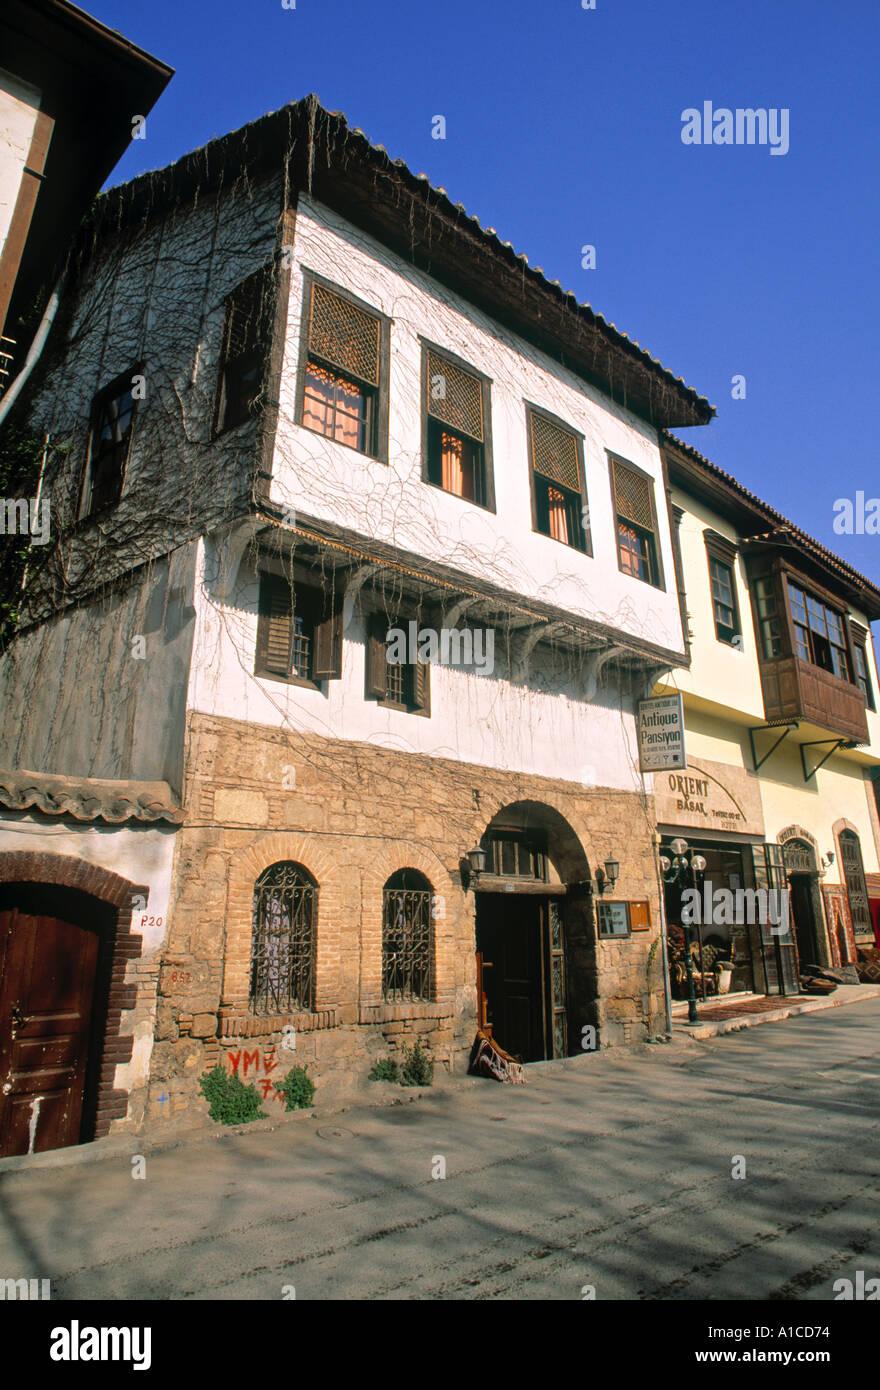 Ottoman house, Kaleici, Antalya, Turkey - Stock Image